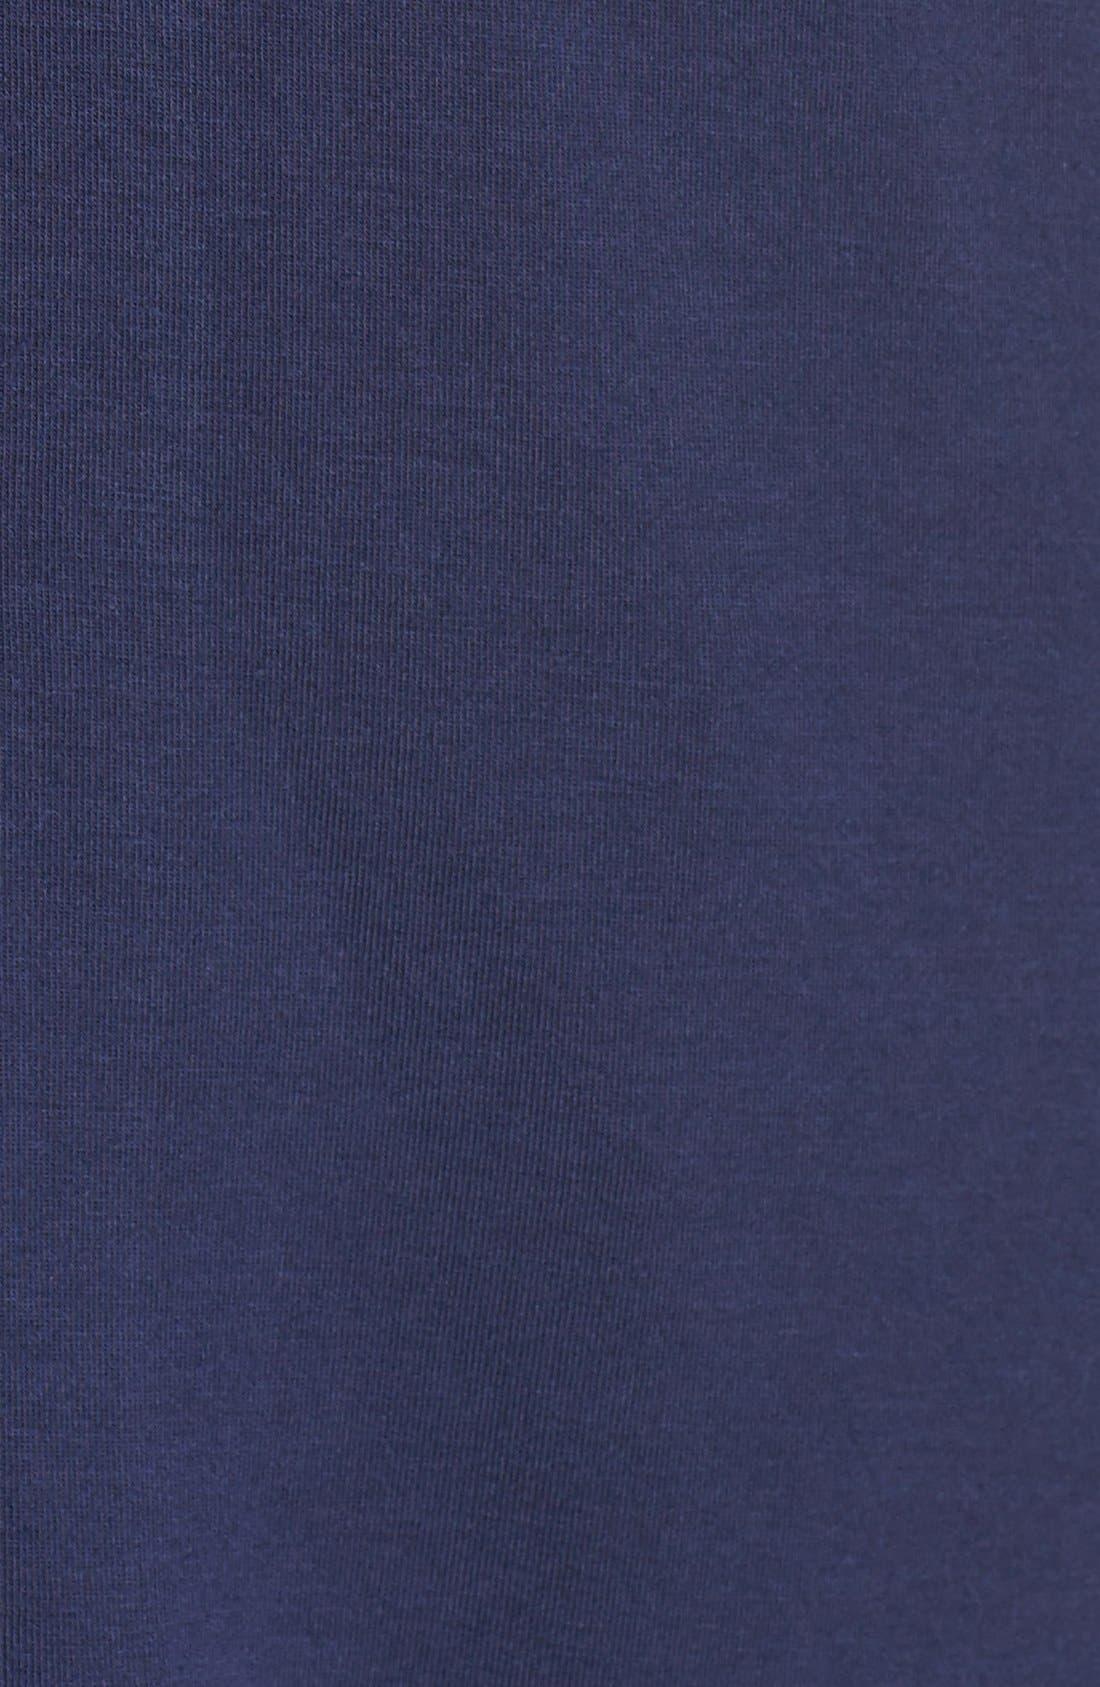 Moonlight Pajamas,                             Alternate thumbnail 5, color,                             Navy Peacoat